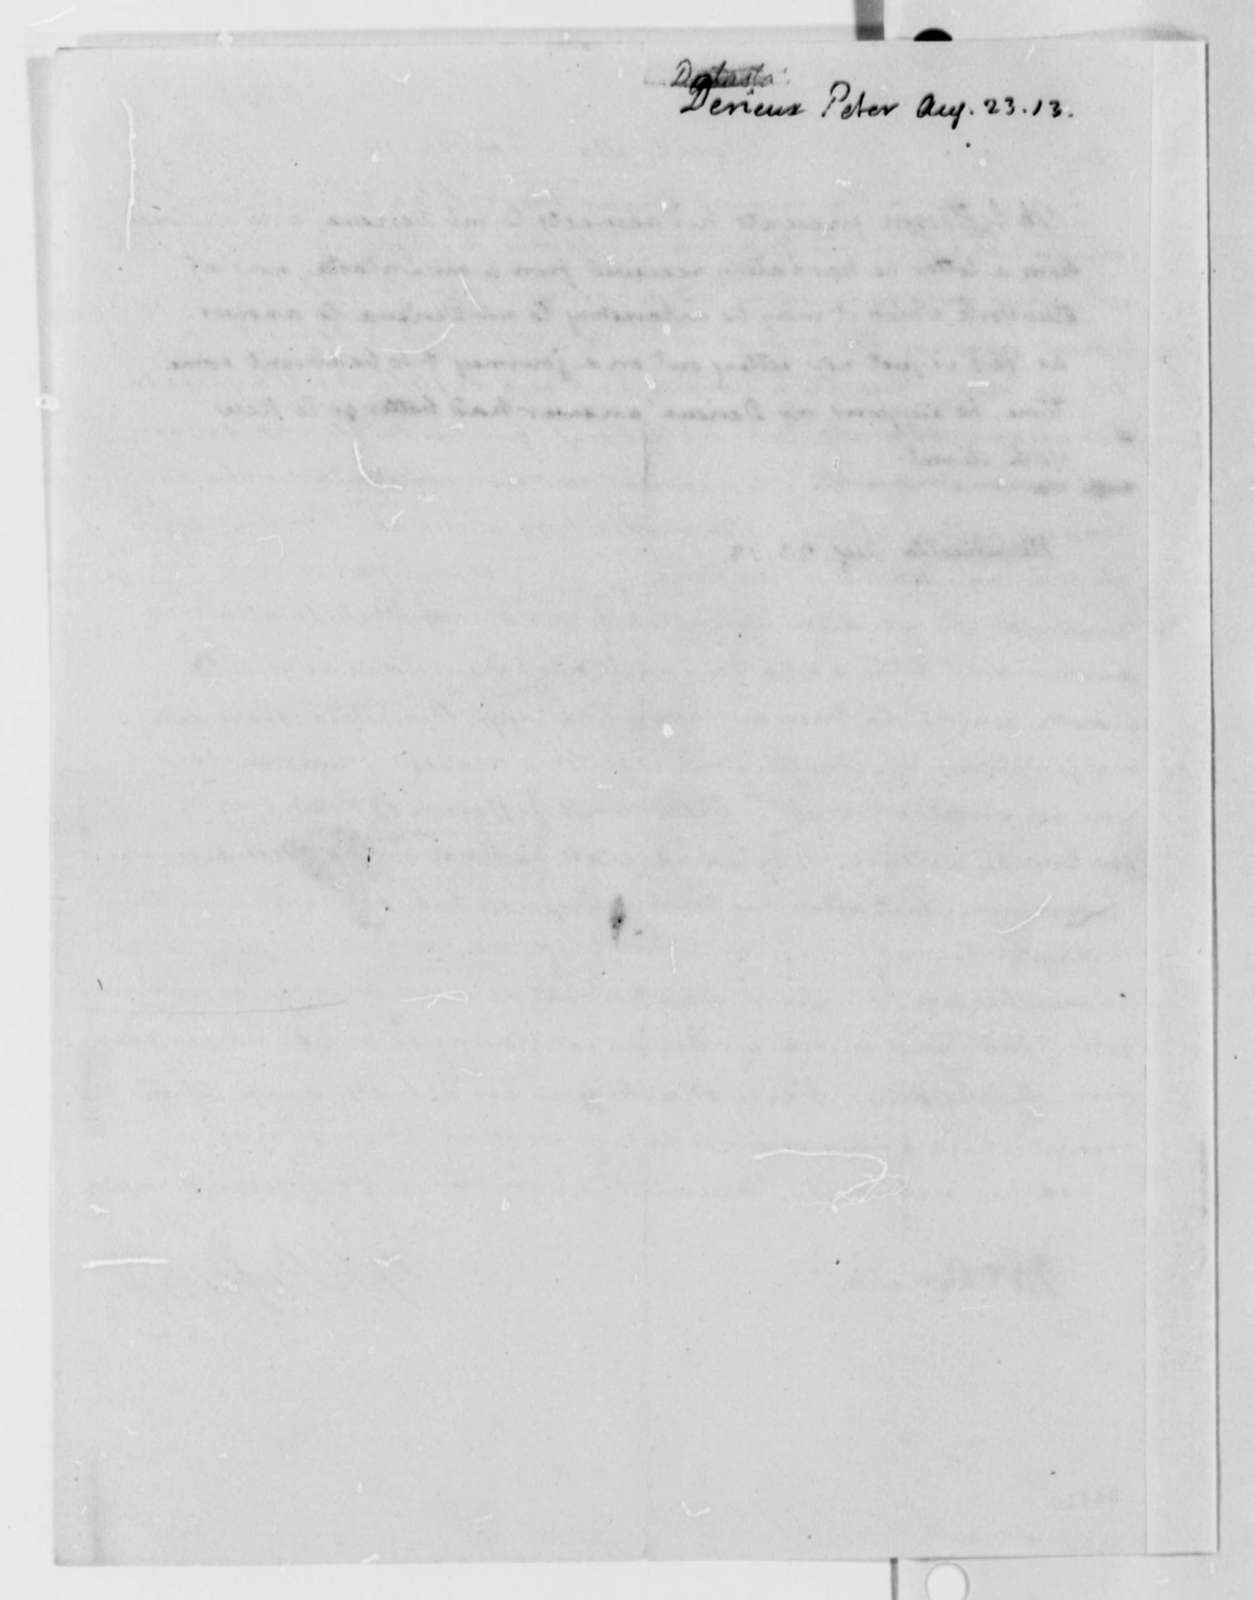 Thomas Jefferson to Justin Pierre Plumard Derieux, August 23, 1813